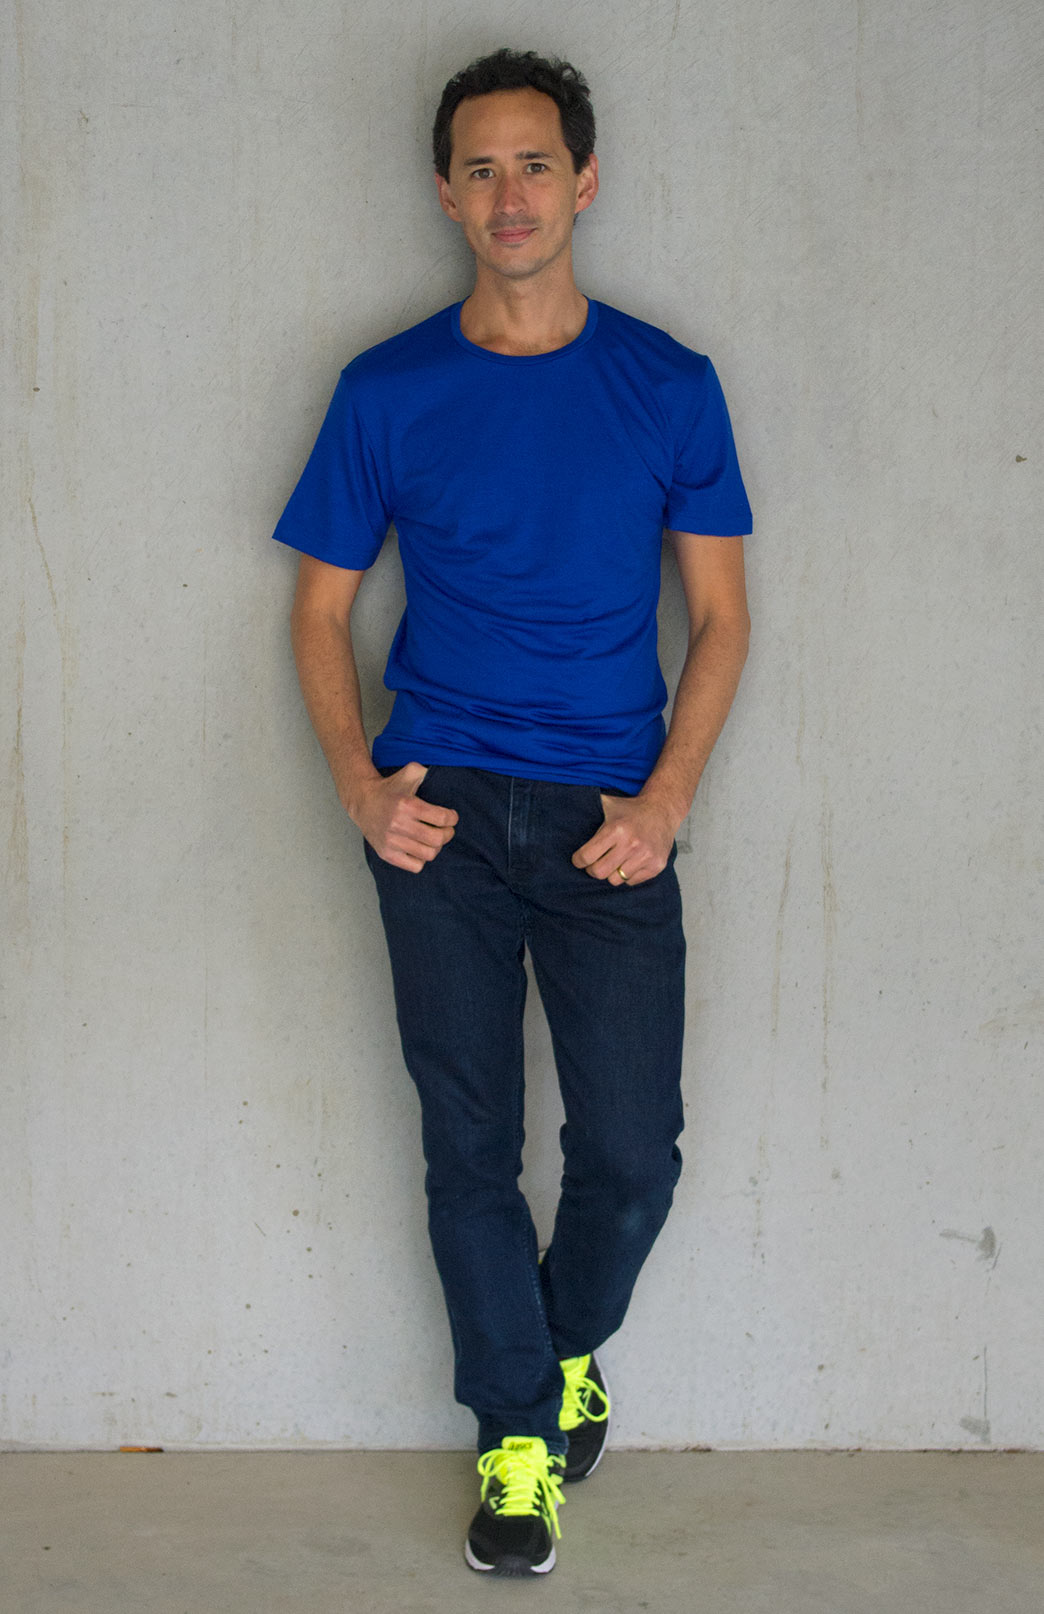 Short Sleeved Crew Neck Top - Lightweight (~170g) - Men's Electric Blue Pure Merino Wool Lightweight Short Sleeved Thermal Top with Crew Neckline - Smitten Merino Tasmania Australia